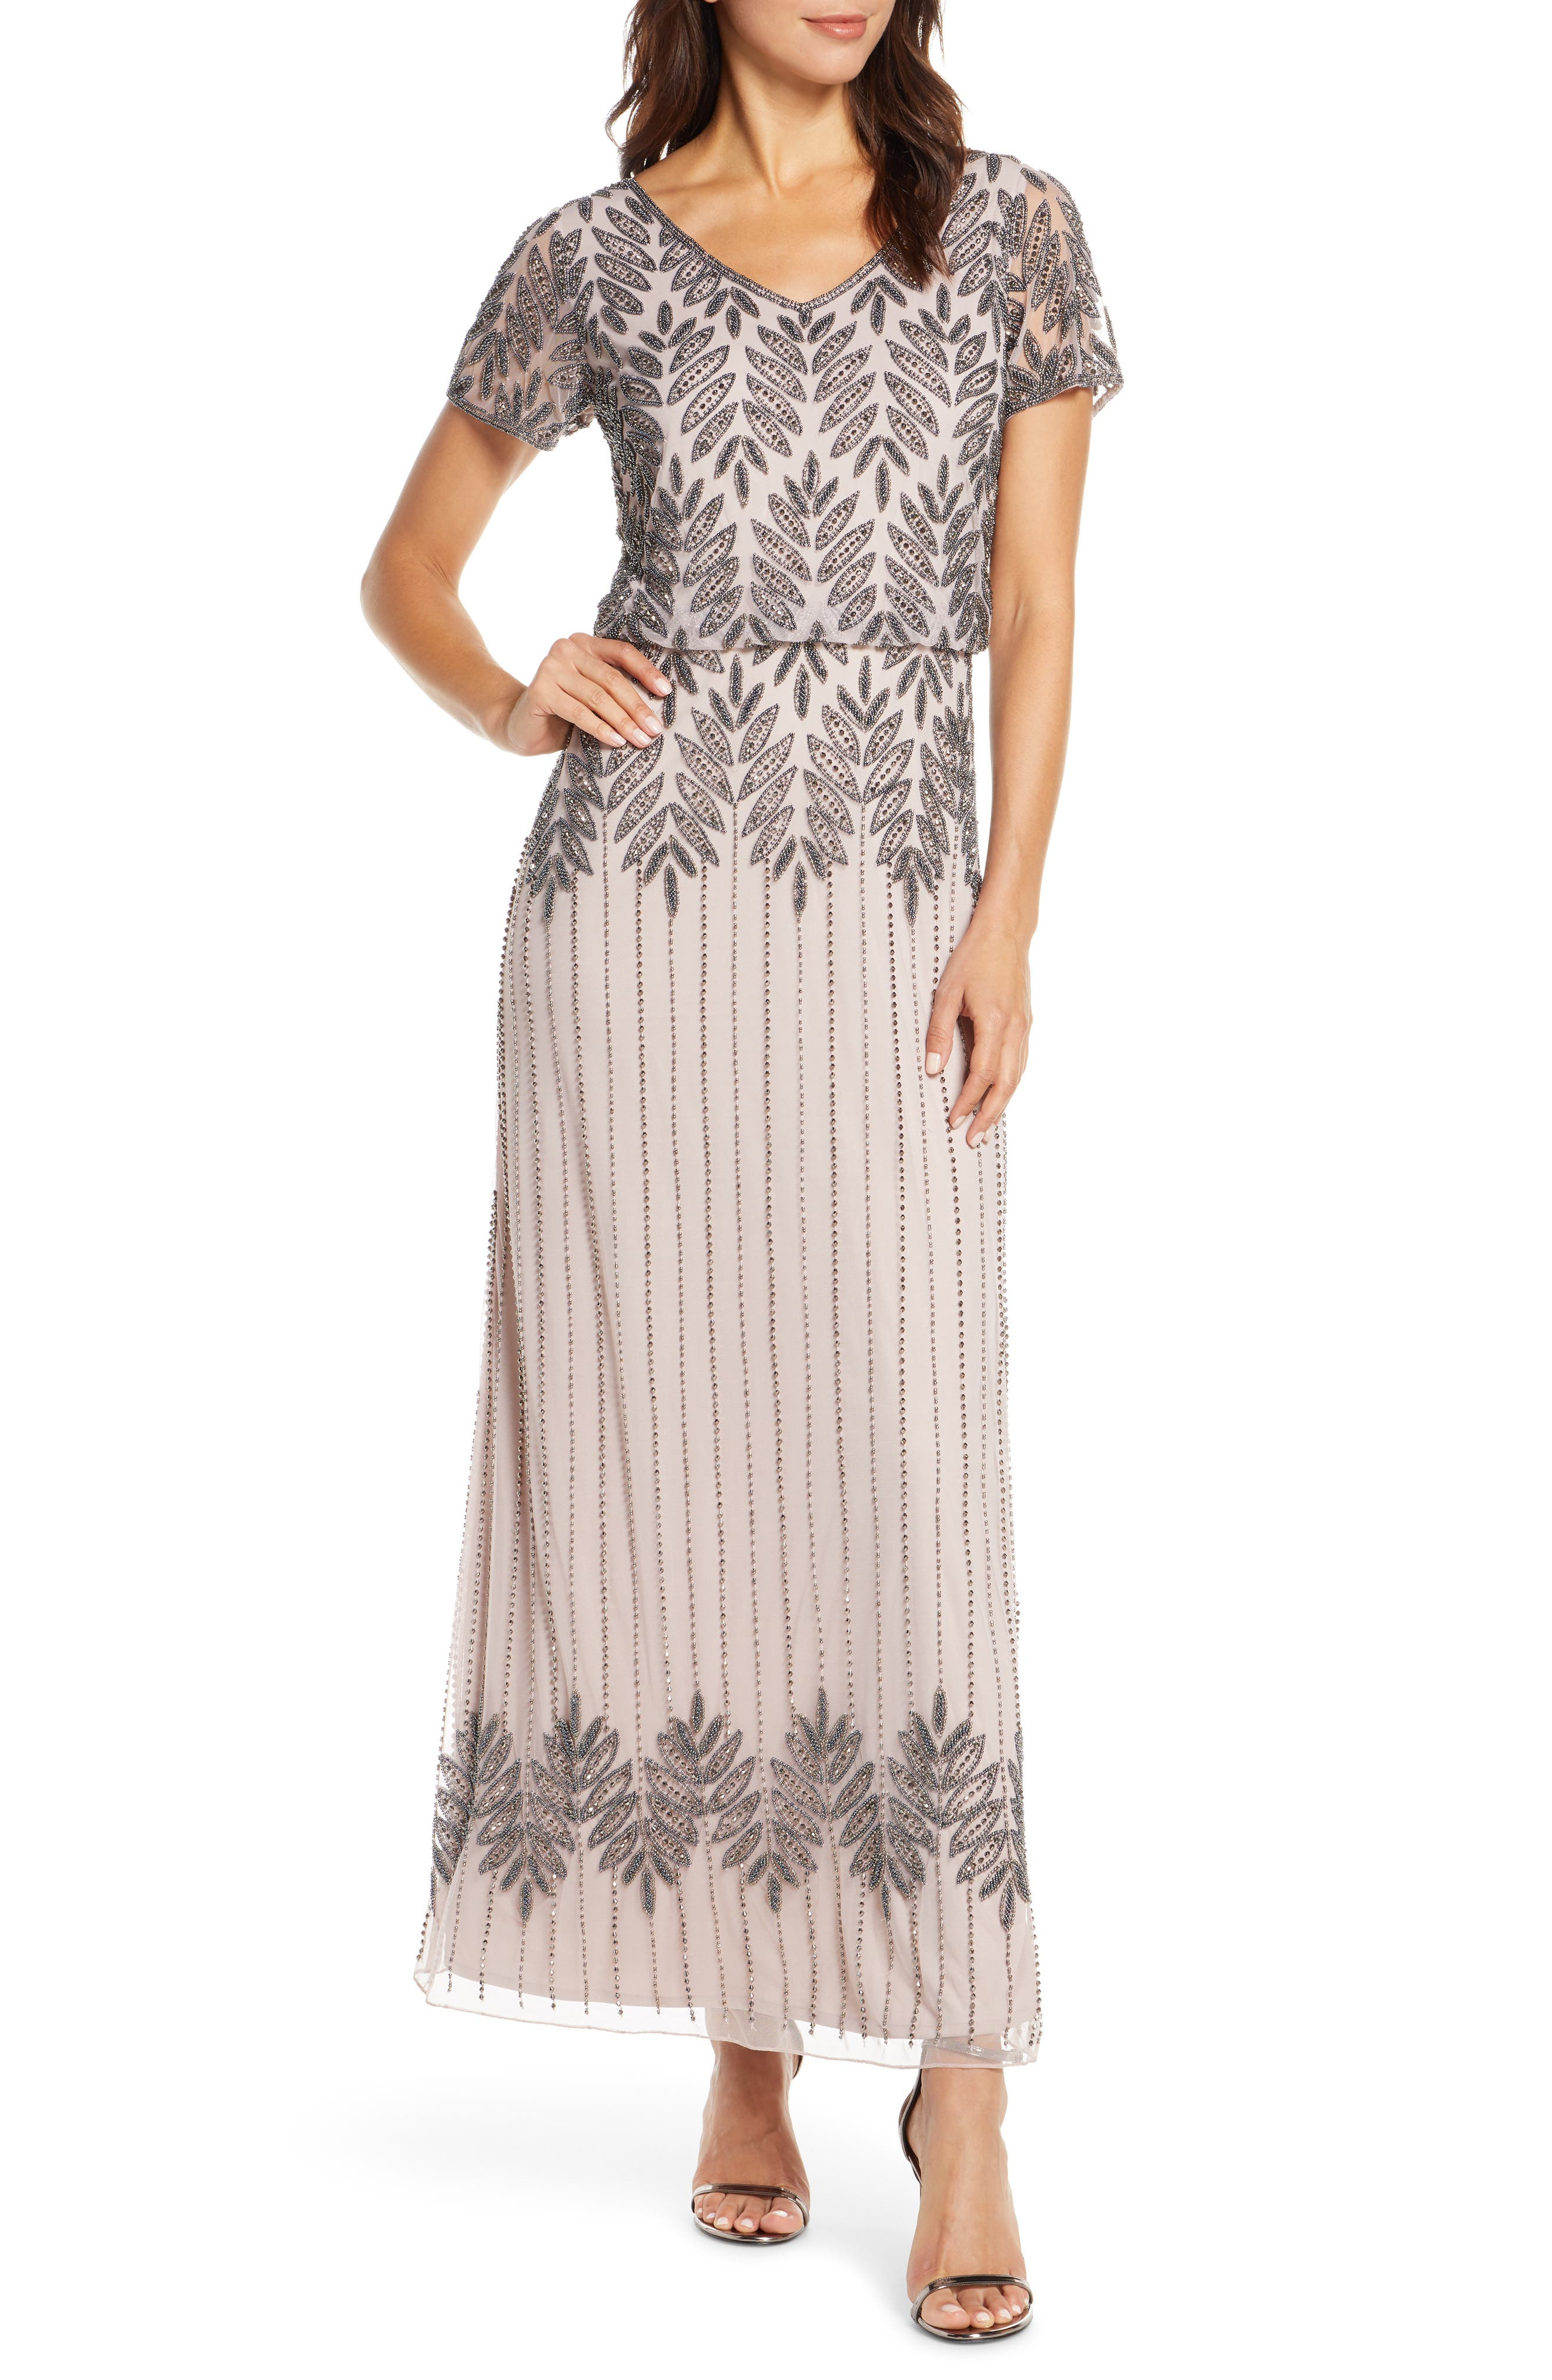 70s Dresses – Disco Dress, Hippie Dress, Wrap Dress Womens Pisarro Nights Beaded Blouson Gown Size 8 - Purple $218.00 AT vintagedancer.com